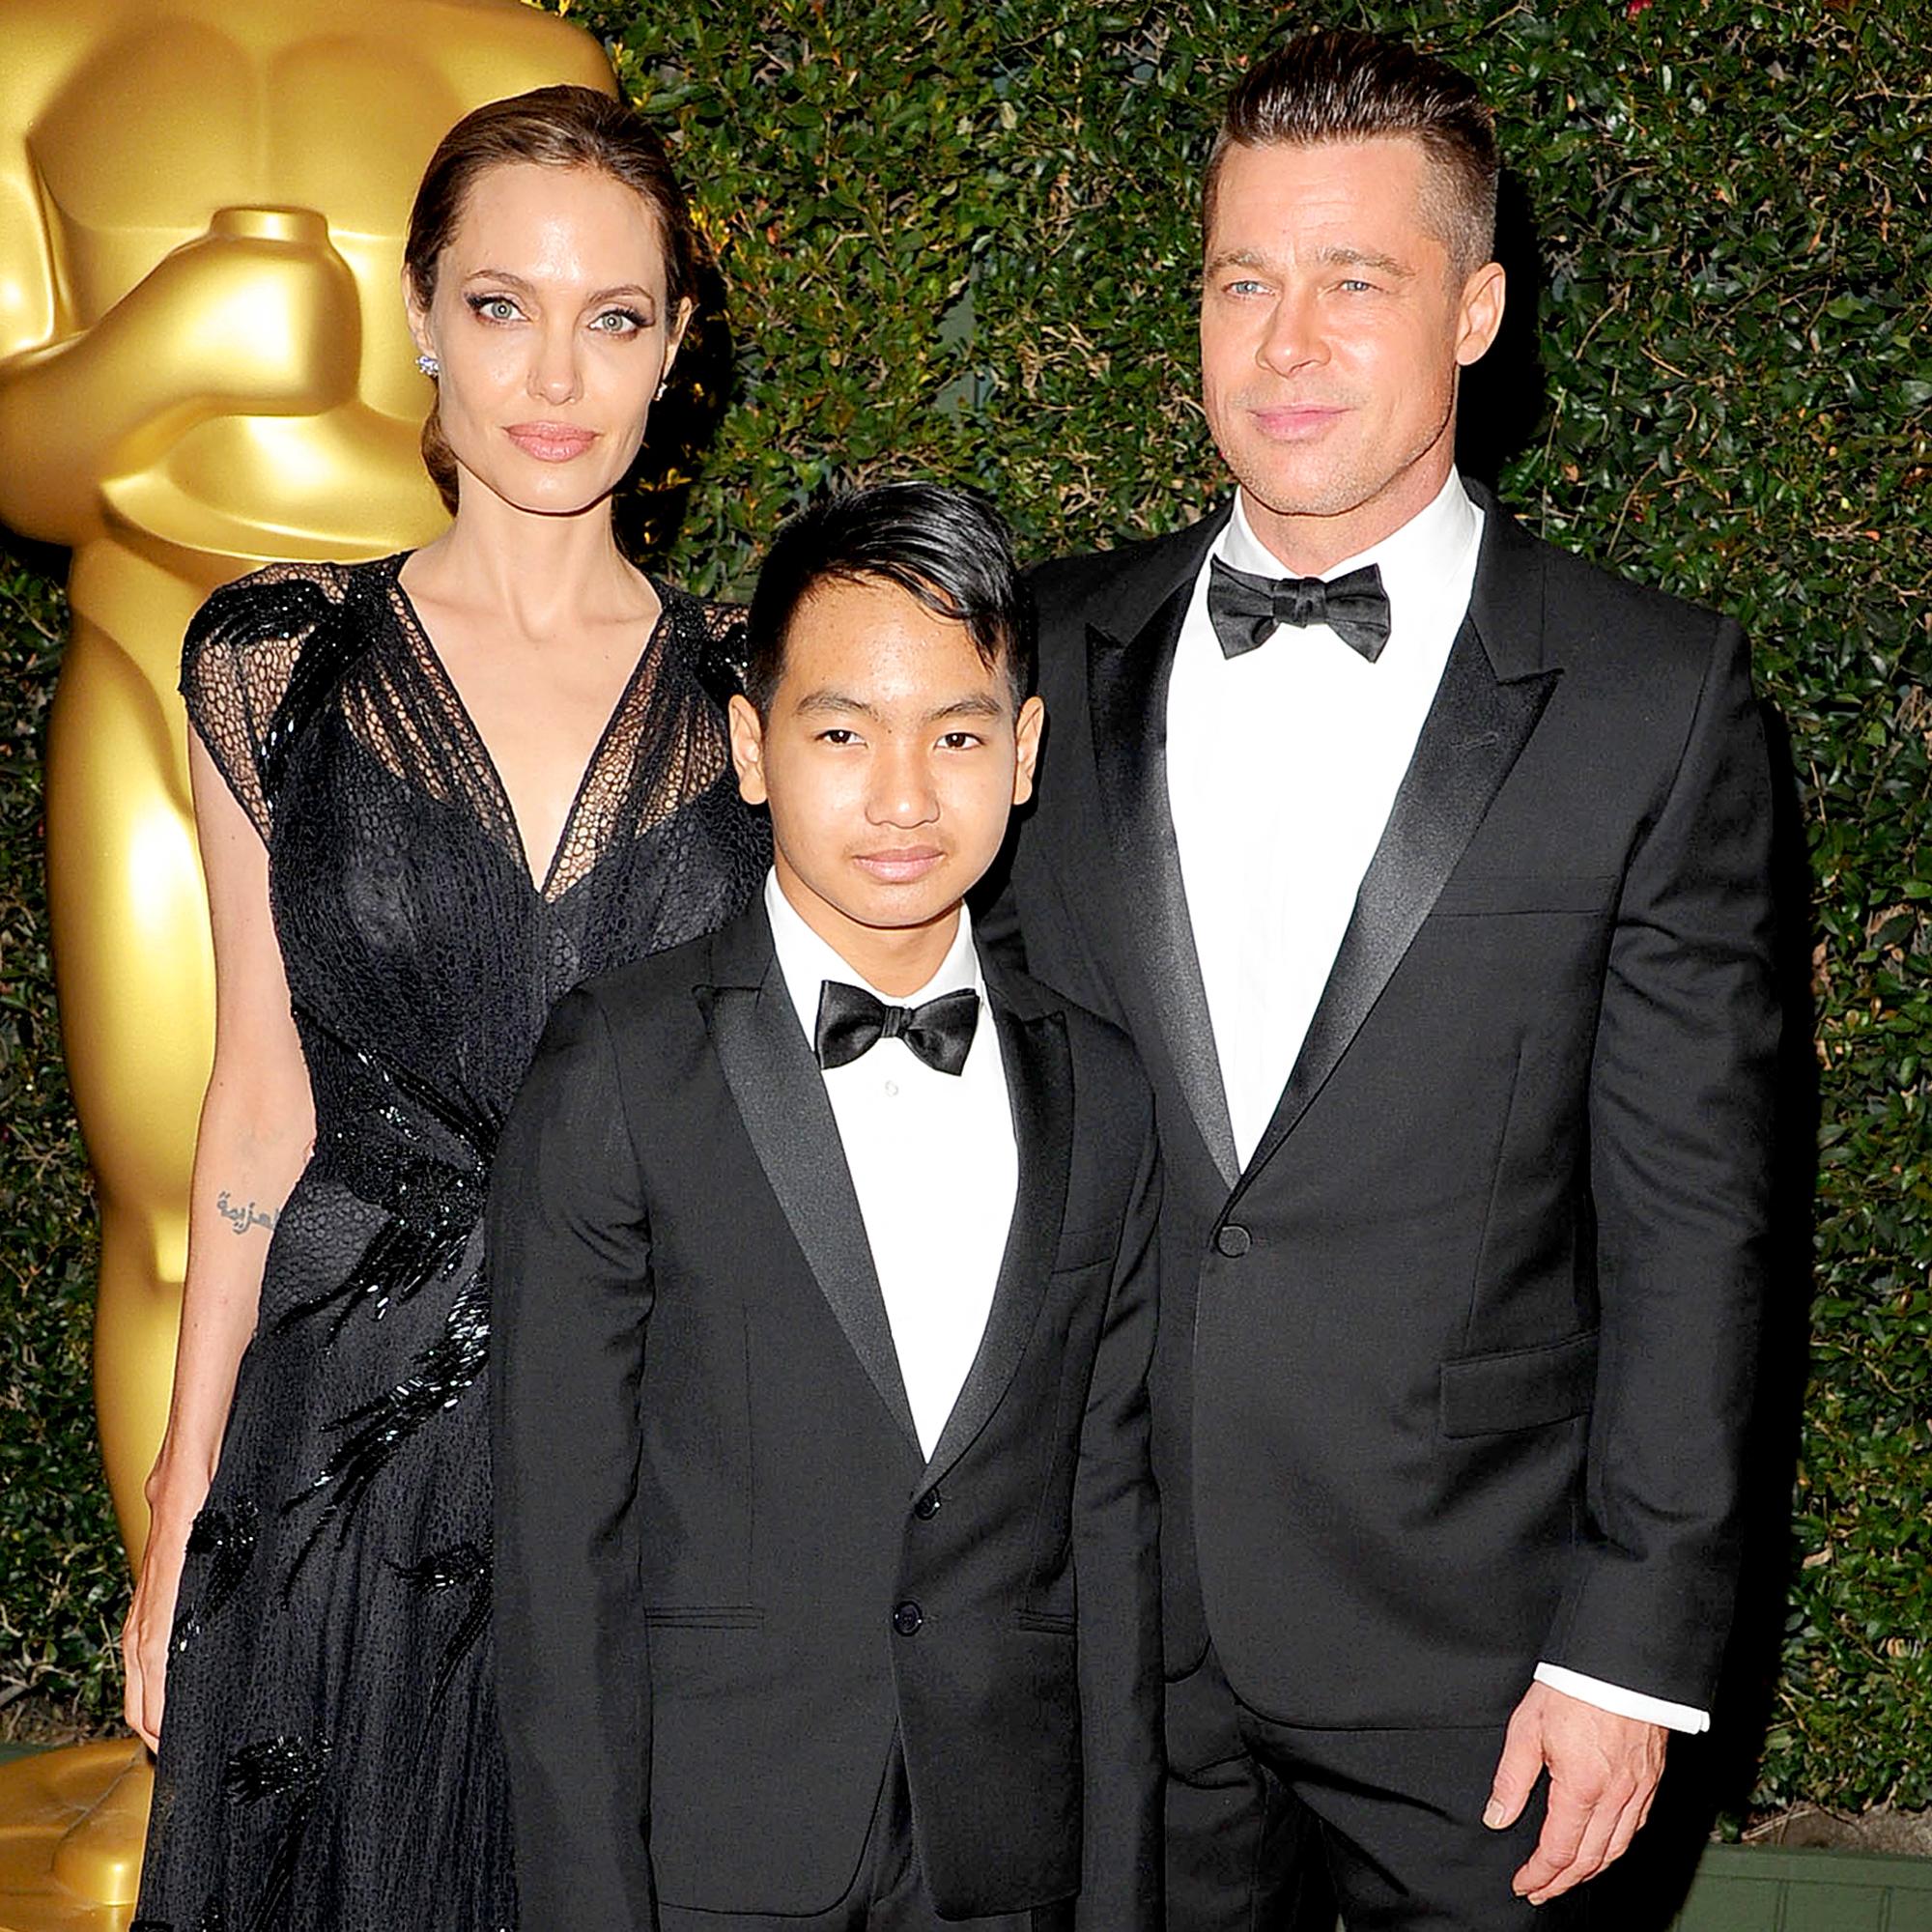 Angelina Jolie, Maddox and Brad Pitt